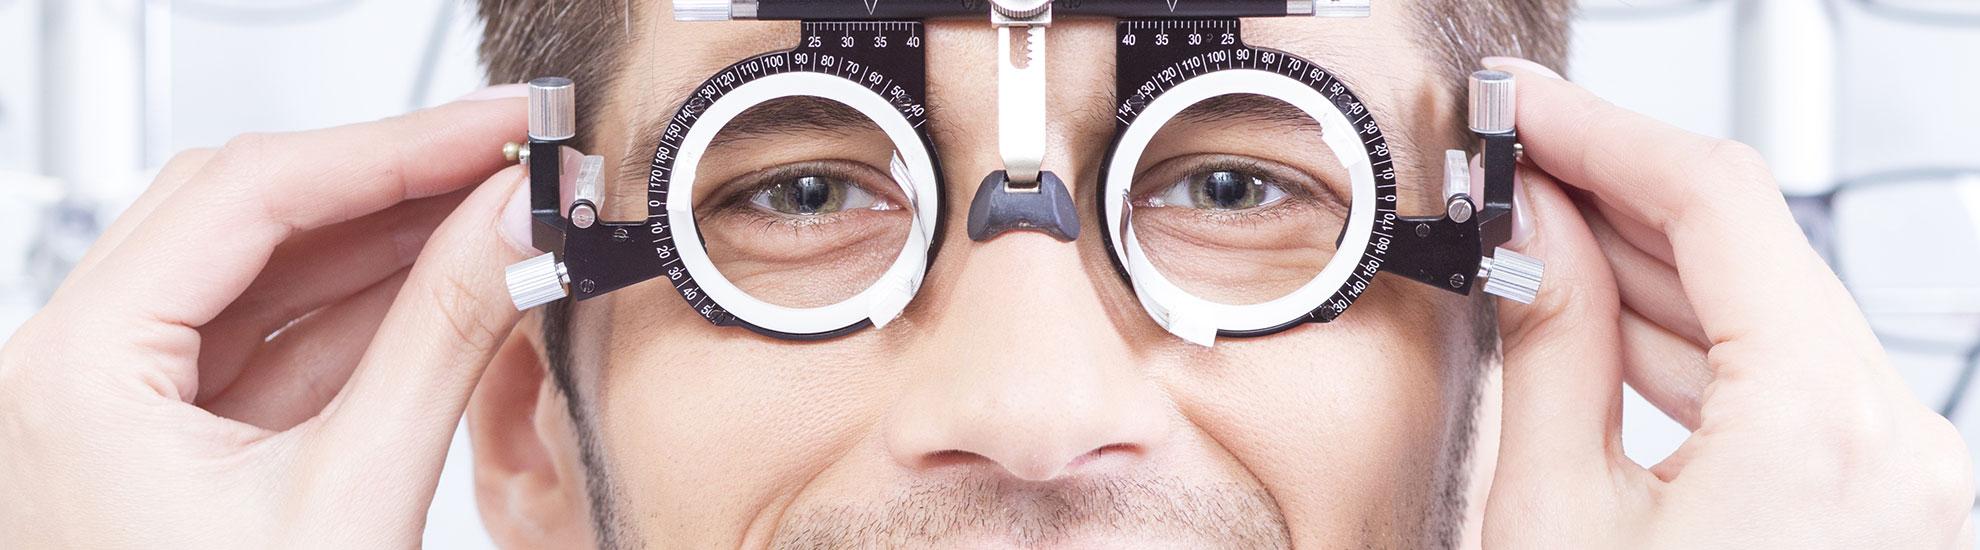 white female pediatric receiving an eye exam